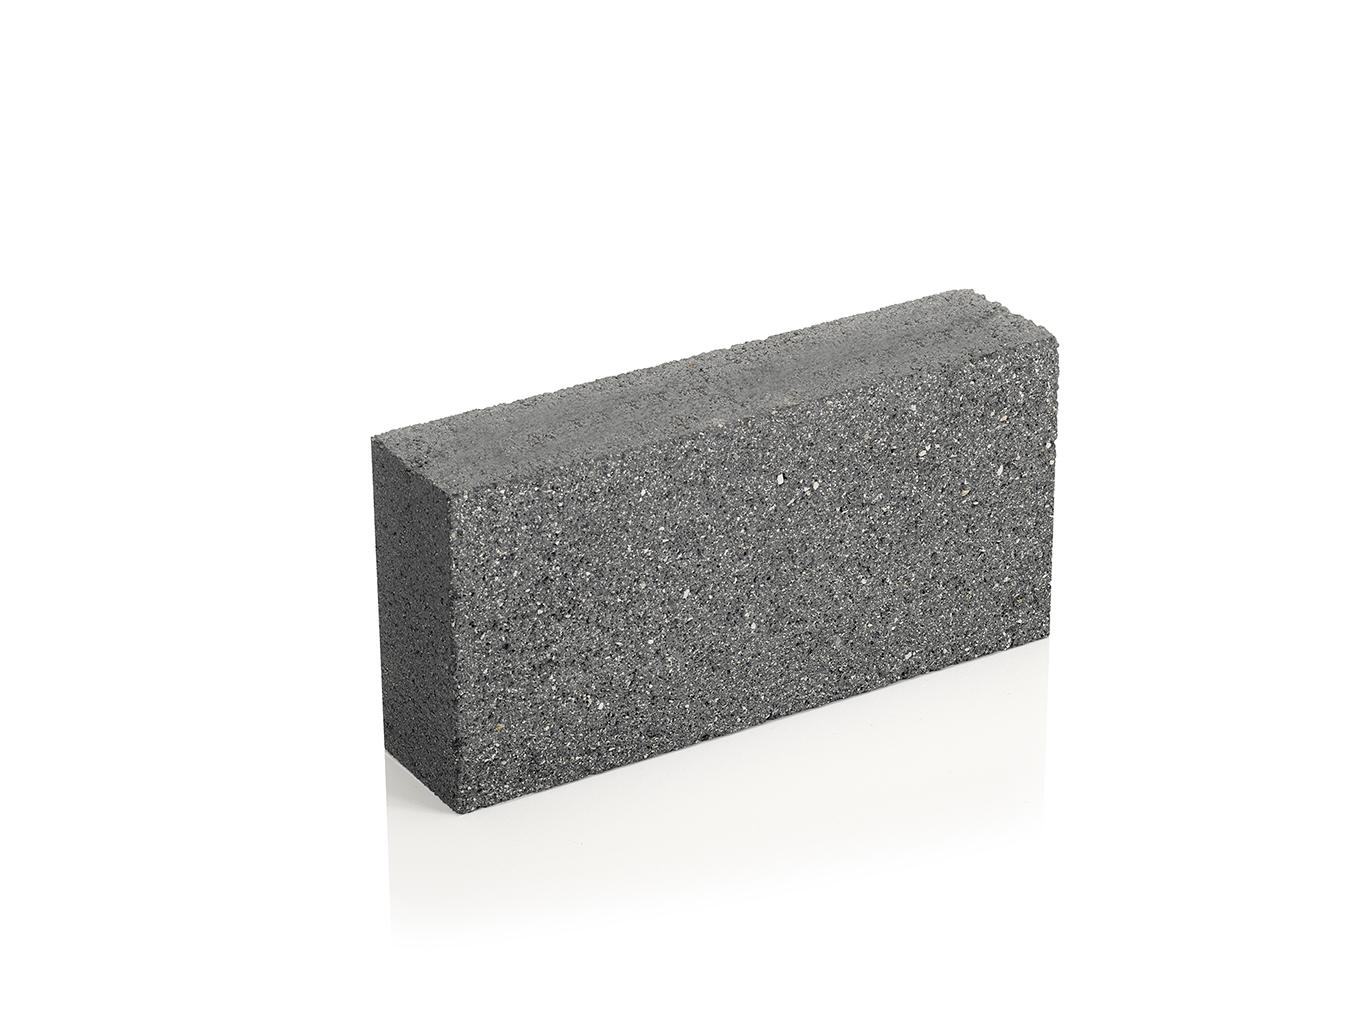 SIZED-Dimond Black 3 Stippled Top.jpg